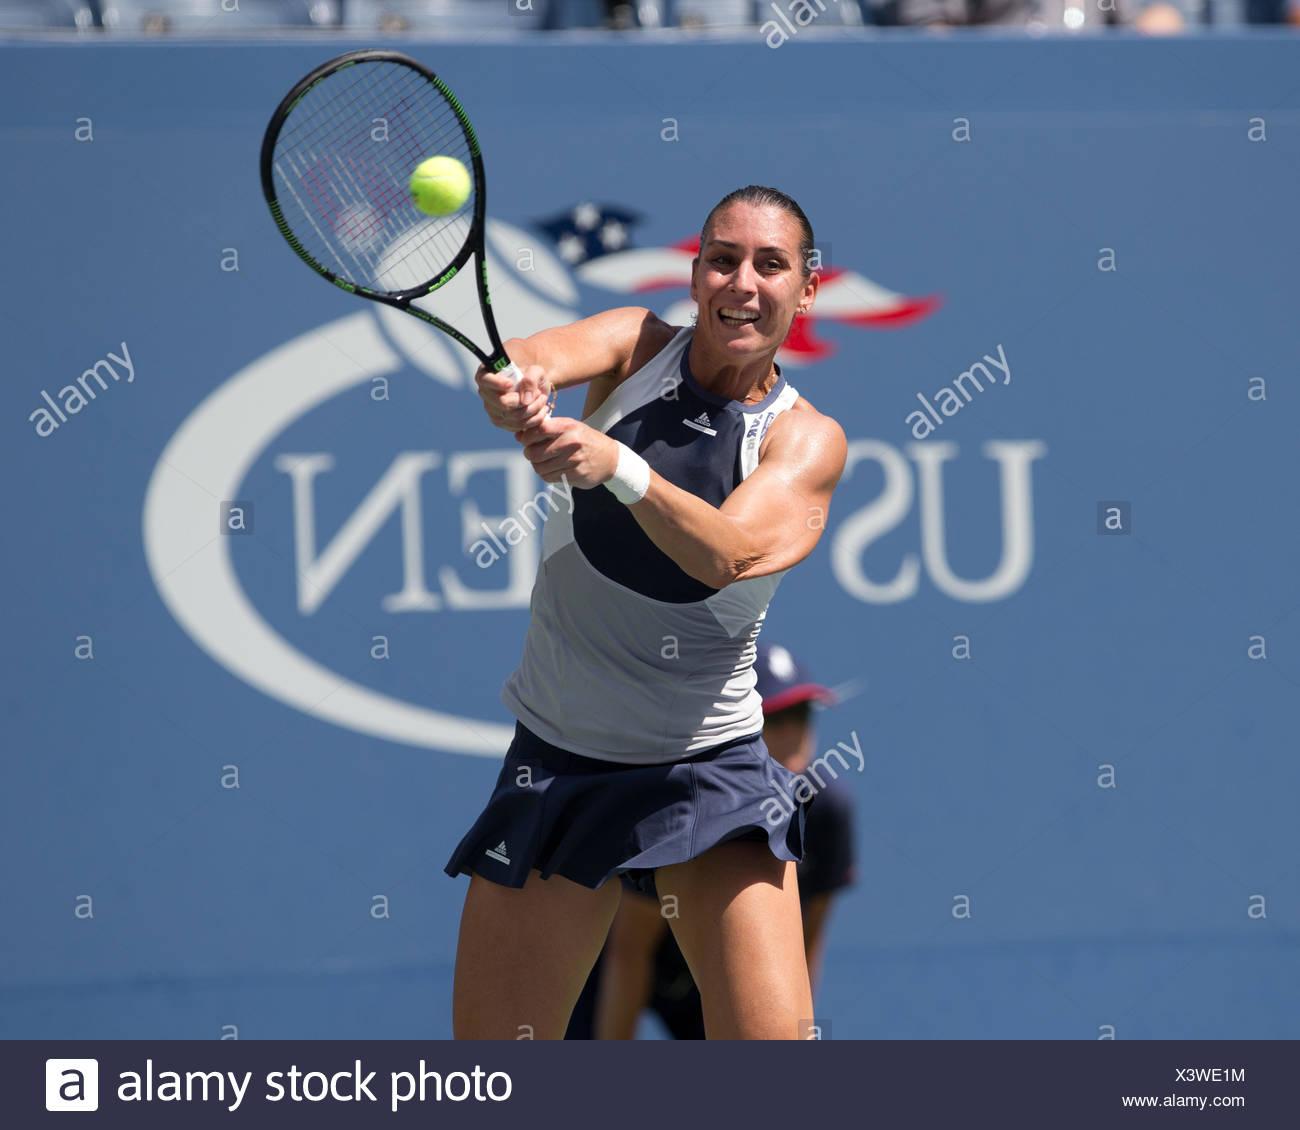 Flavia Pennetta, ITA, US Open 2015, Grand Slam tennis tournament, Flushing Meadows, New York, USA Stock Photo